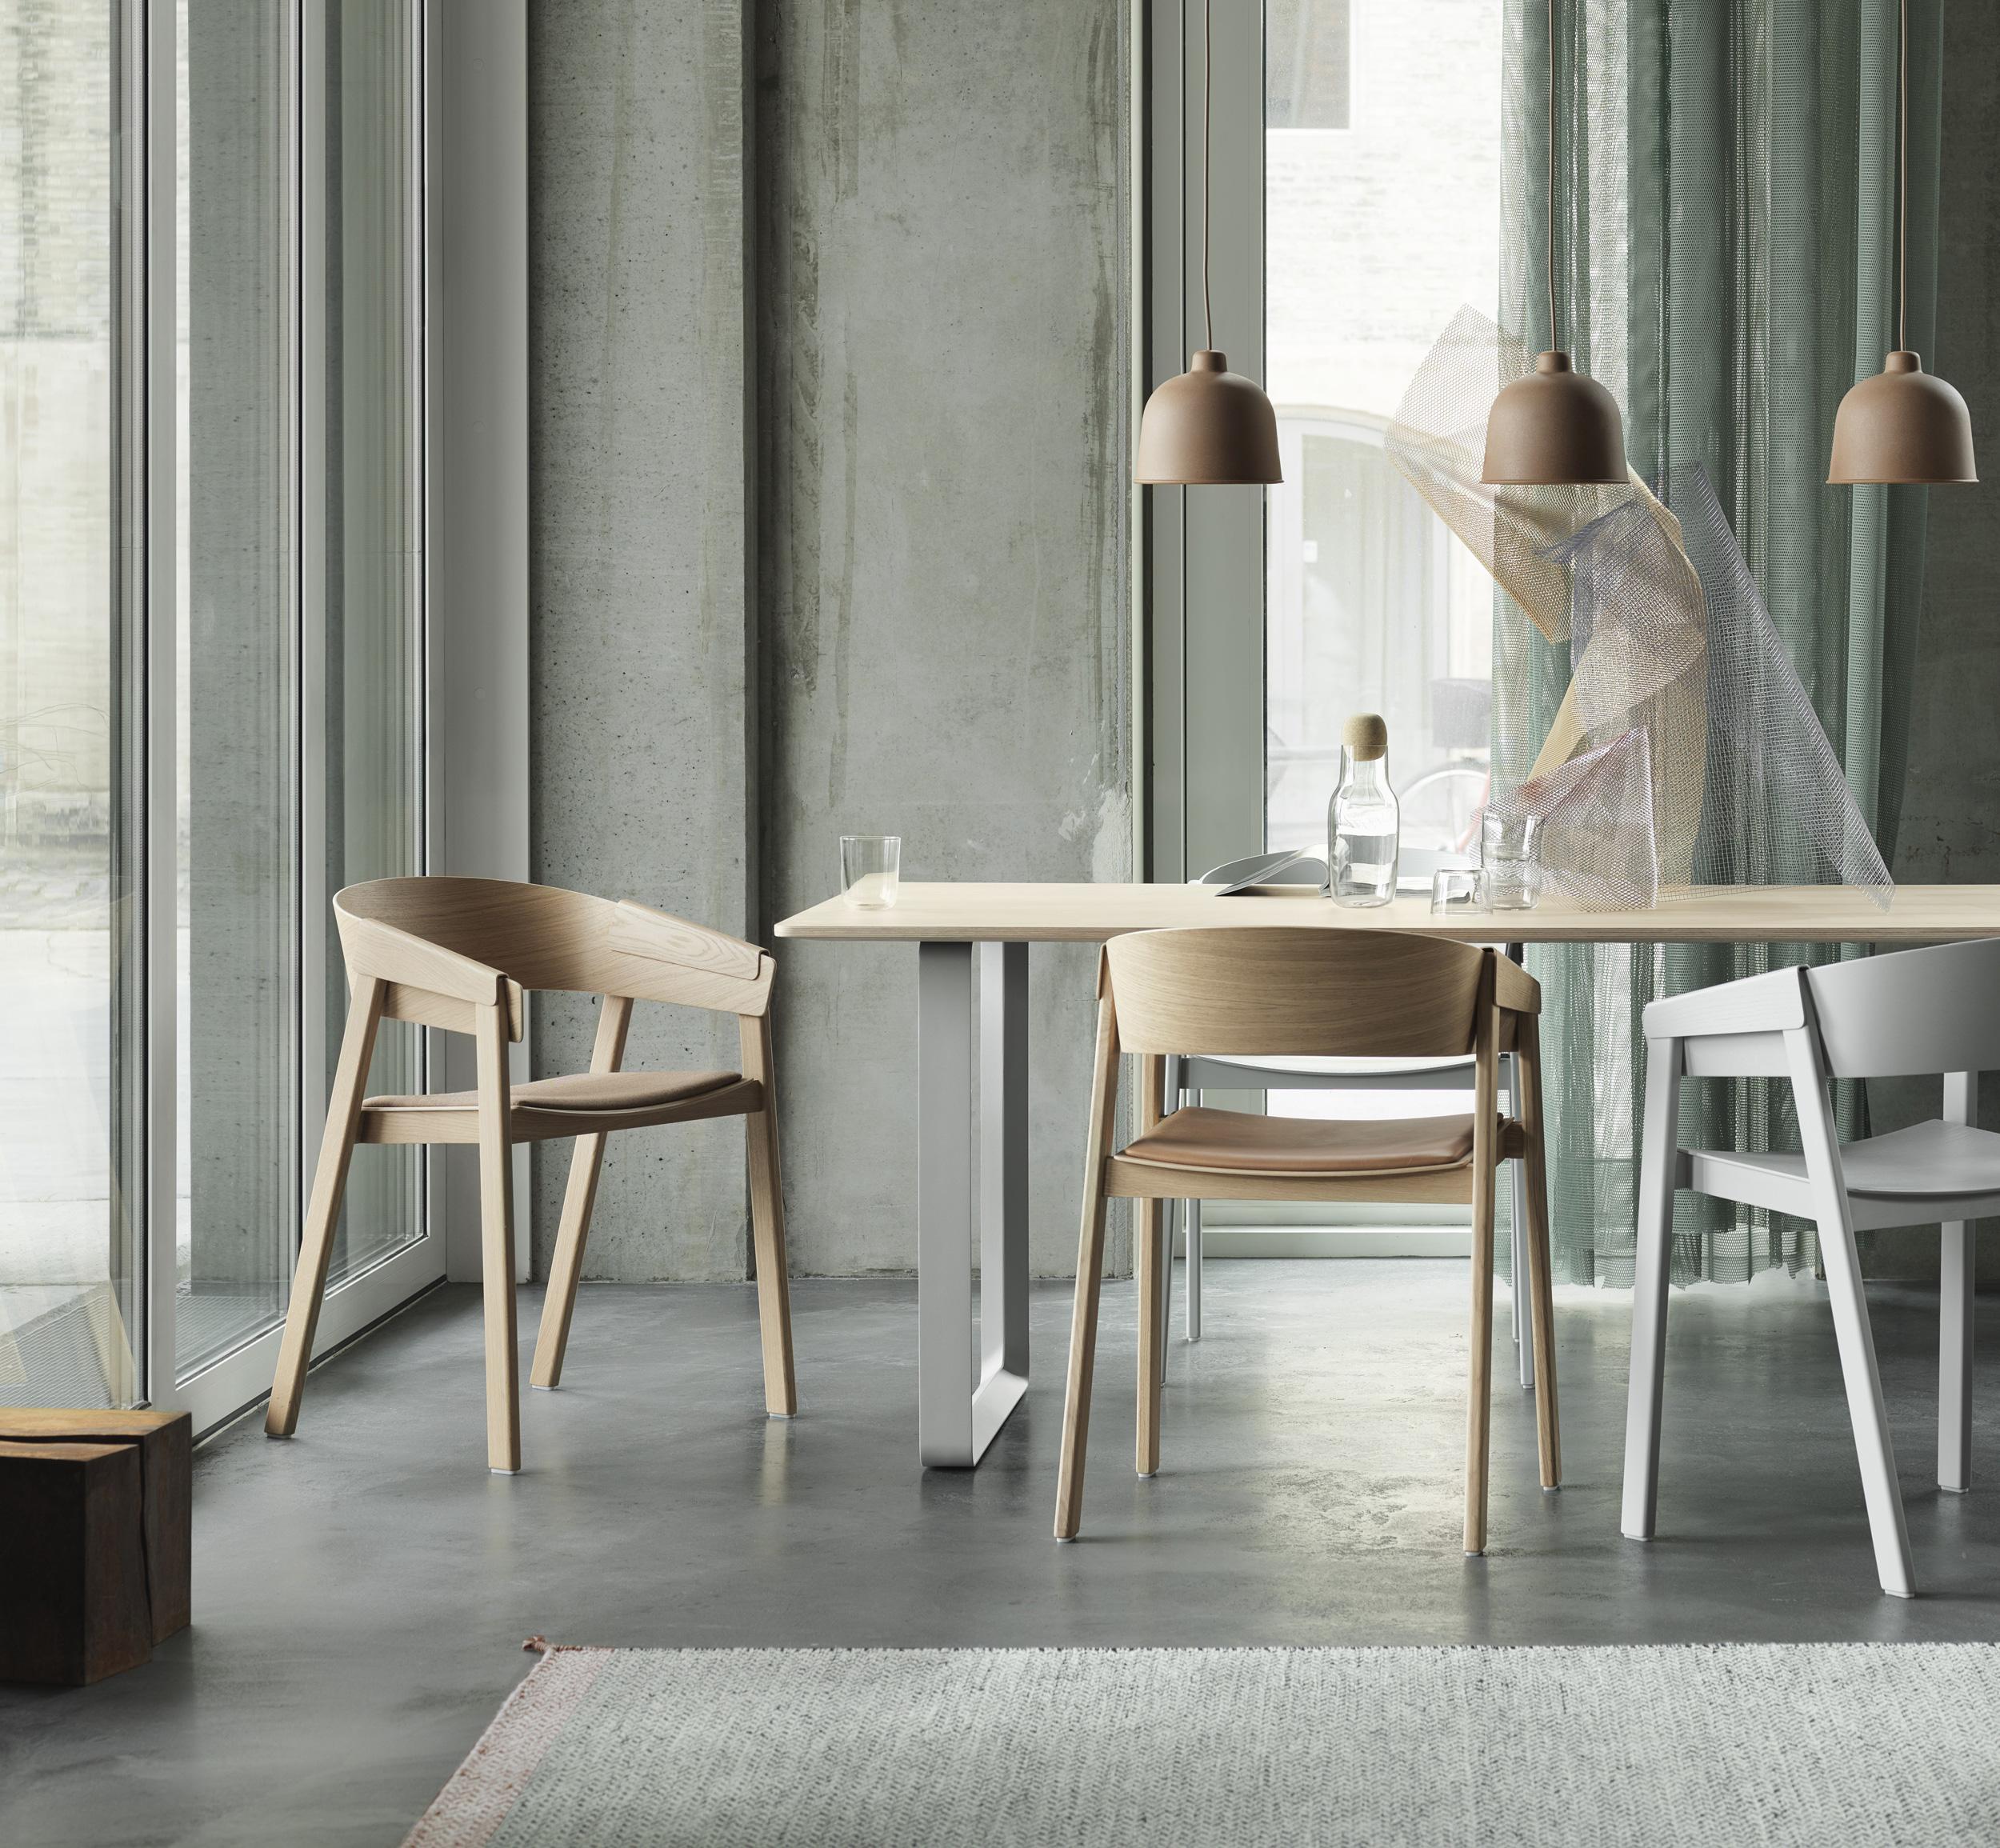 Cover-chair-7070-table-grain-pendant-lamp-corky.jpg